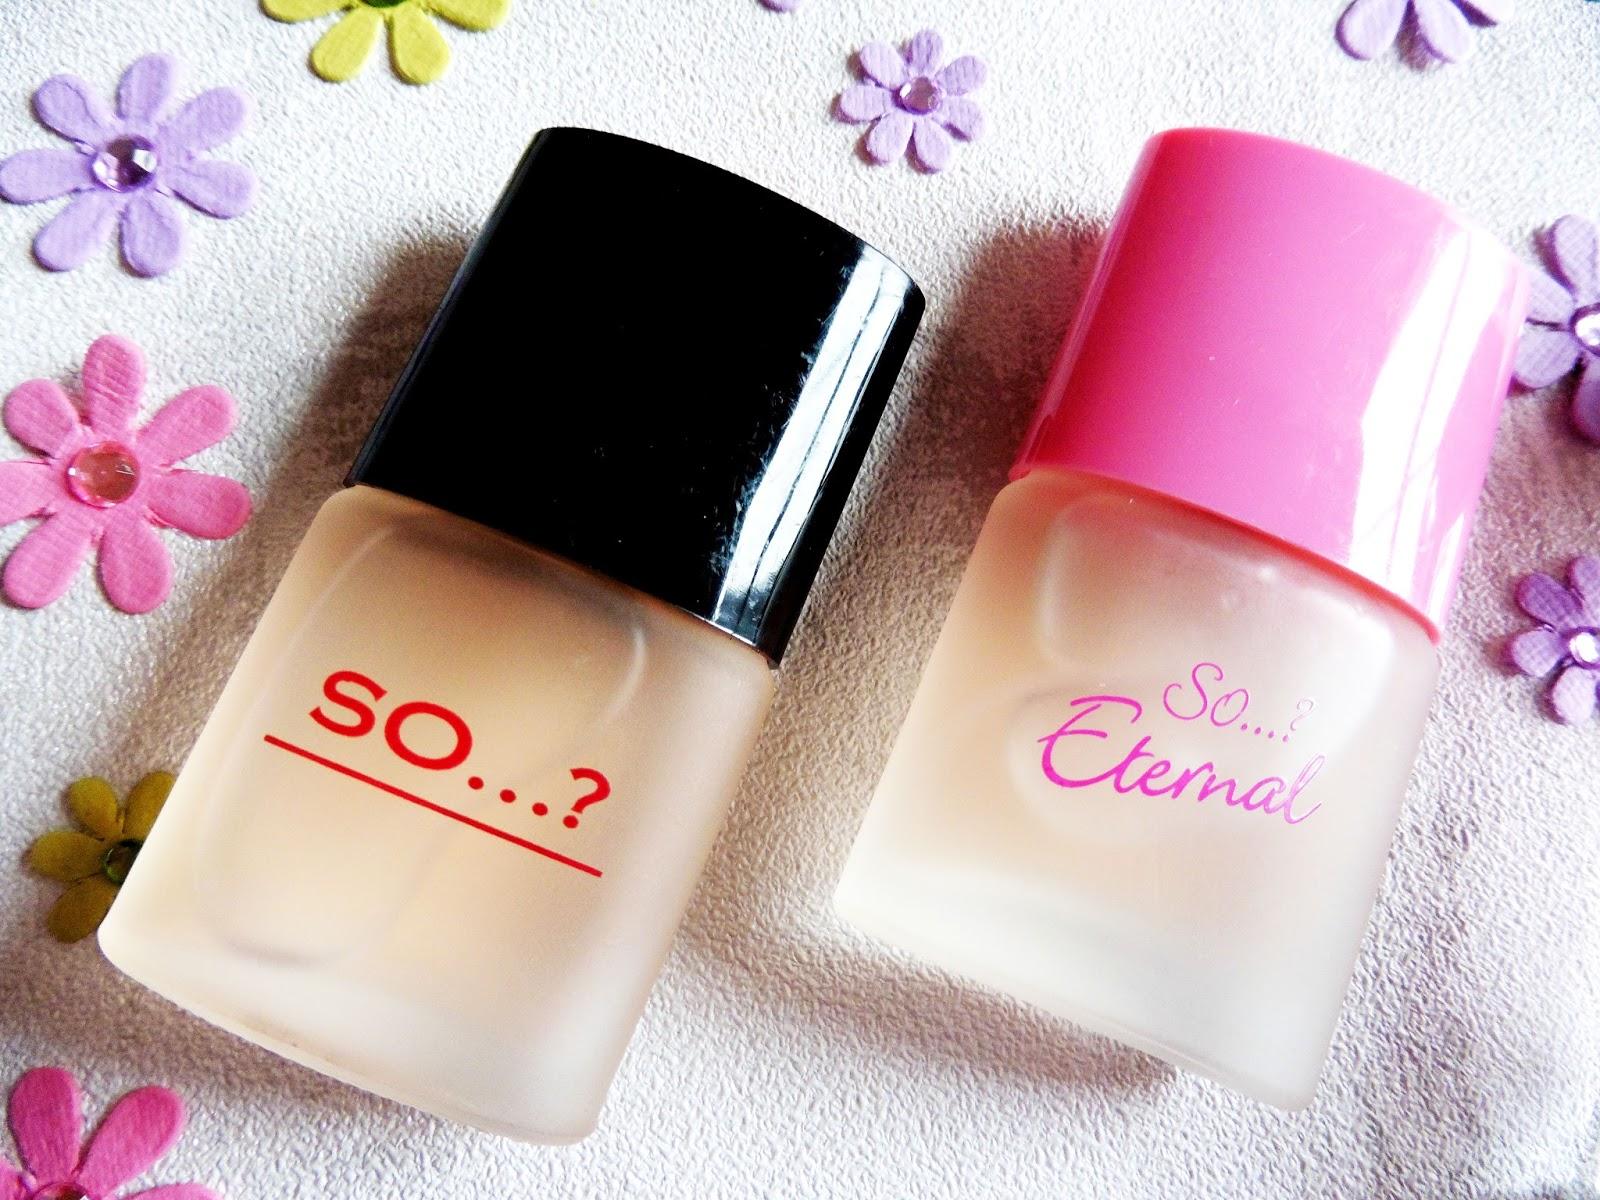 lebellelavie - Reminiscing my teenage years with So...? body fragrance